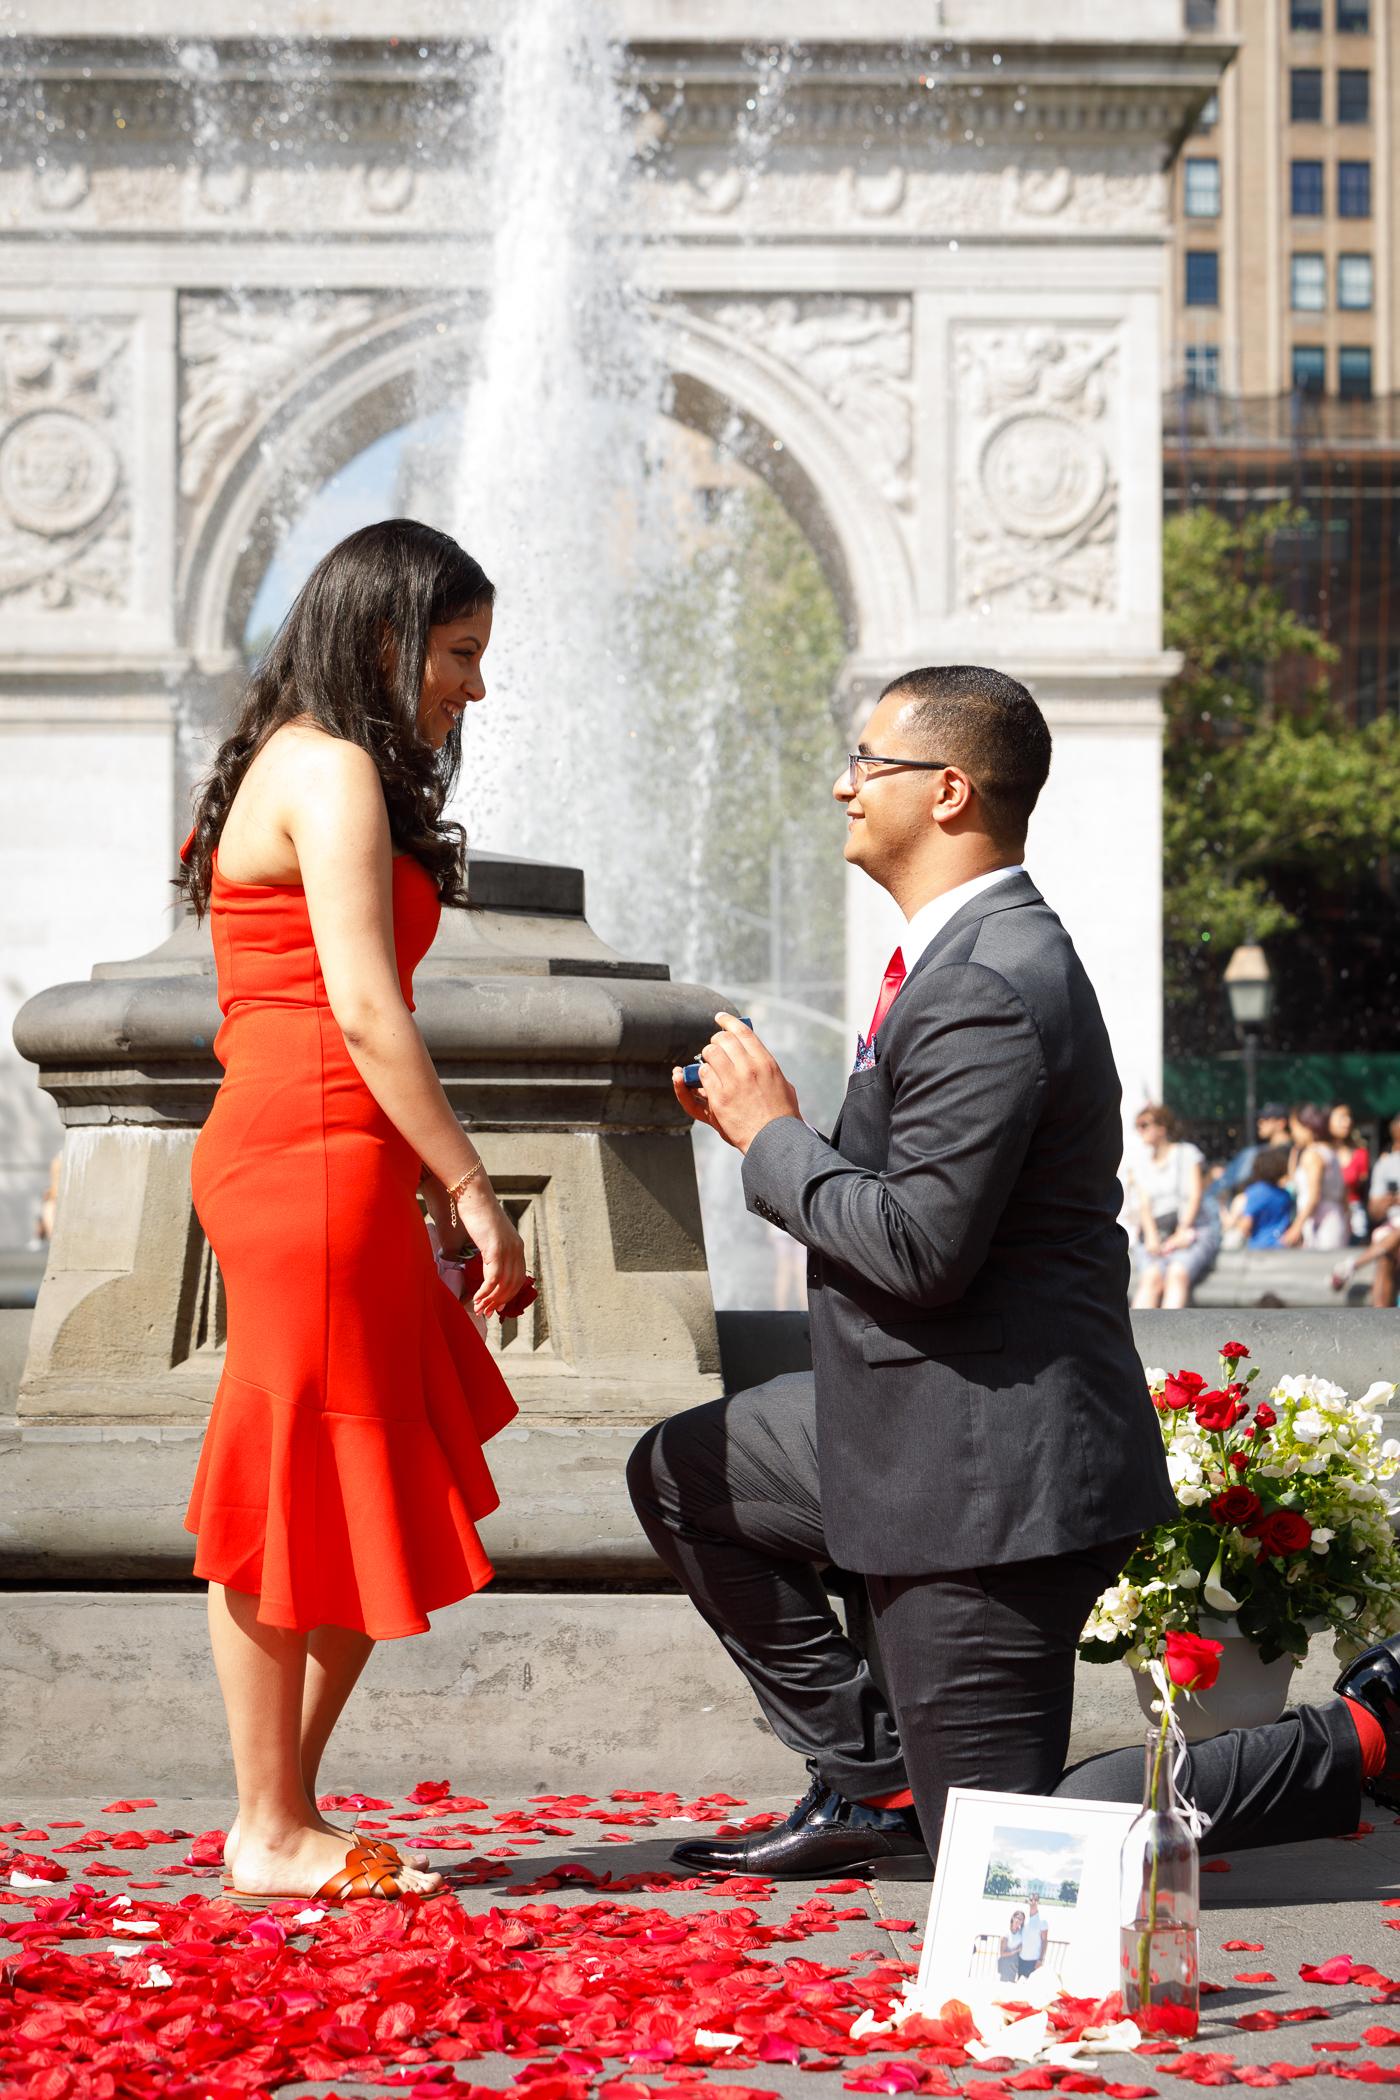 Kiro Rebecca Washington Square Park Marriage Proposal _ Jonathan Heisler _ 6152019 _022.jpg